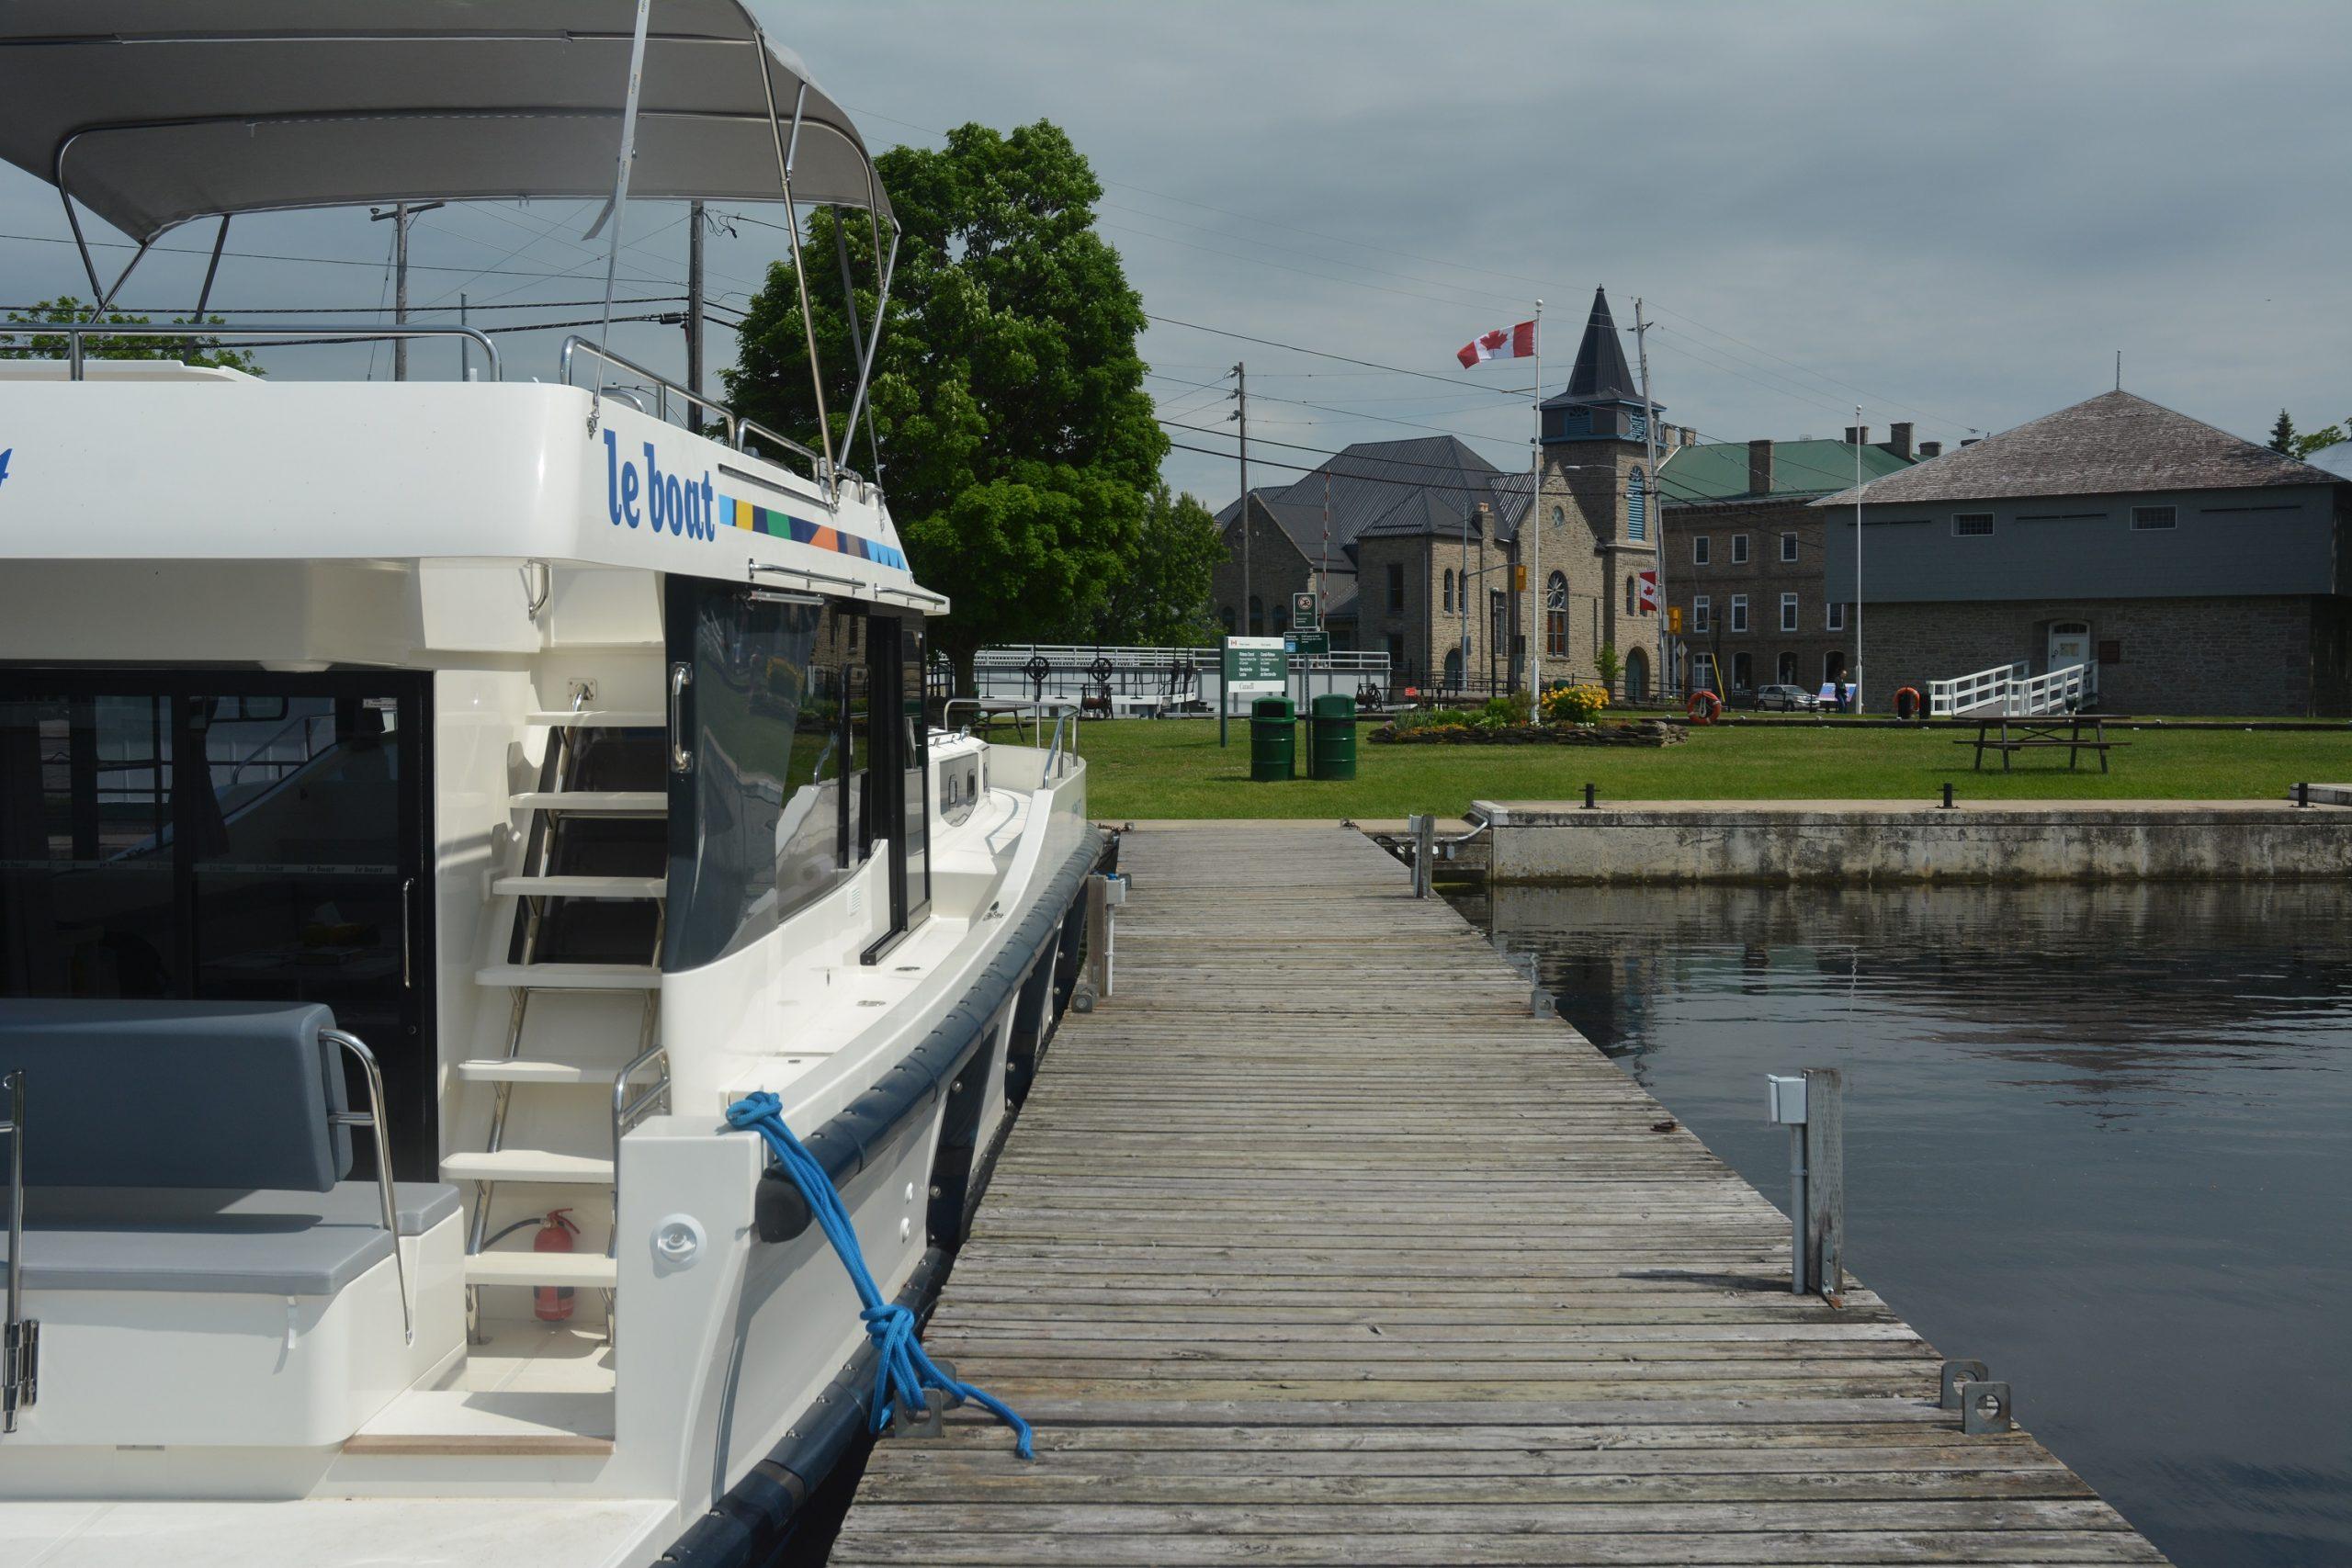 Merrickville, a town along Canada's Rideau Canal